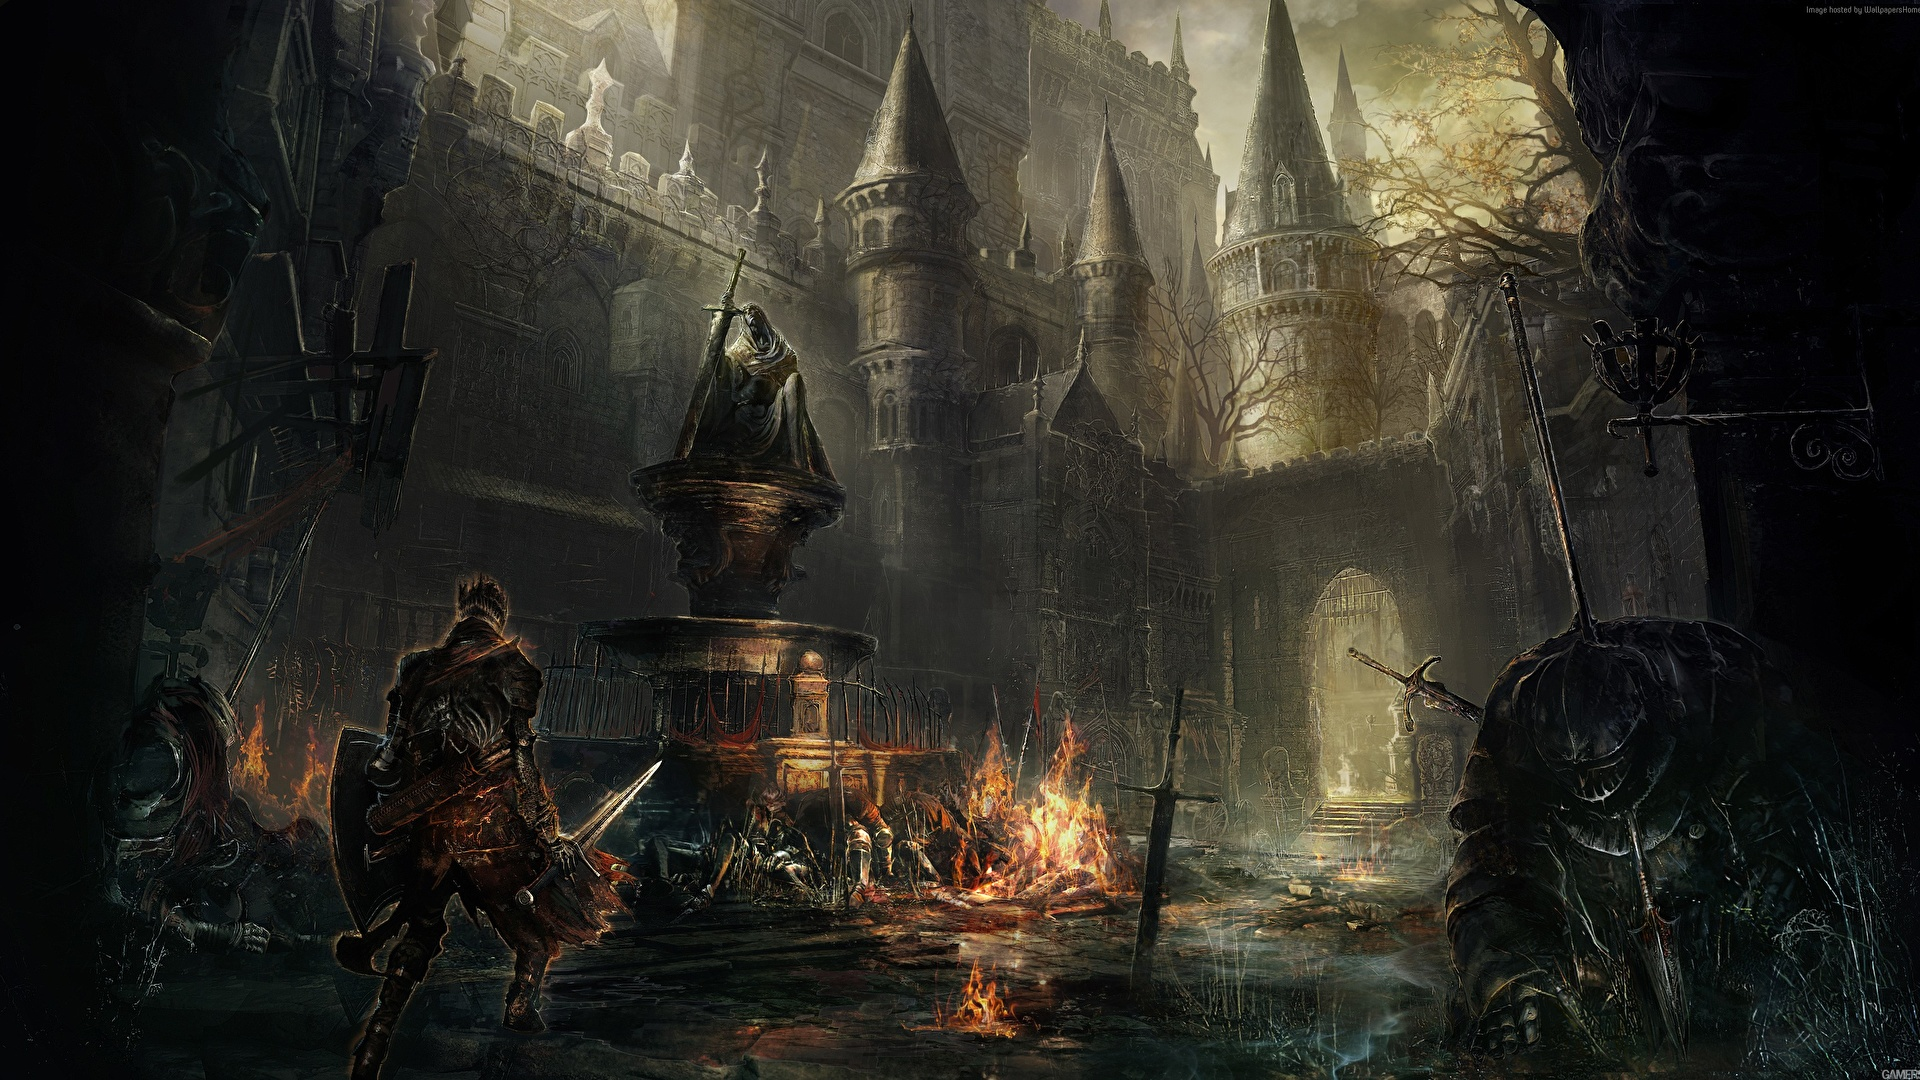 dark, souls, dark, souls, warrior, knight без смс